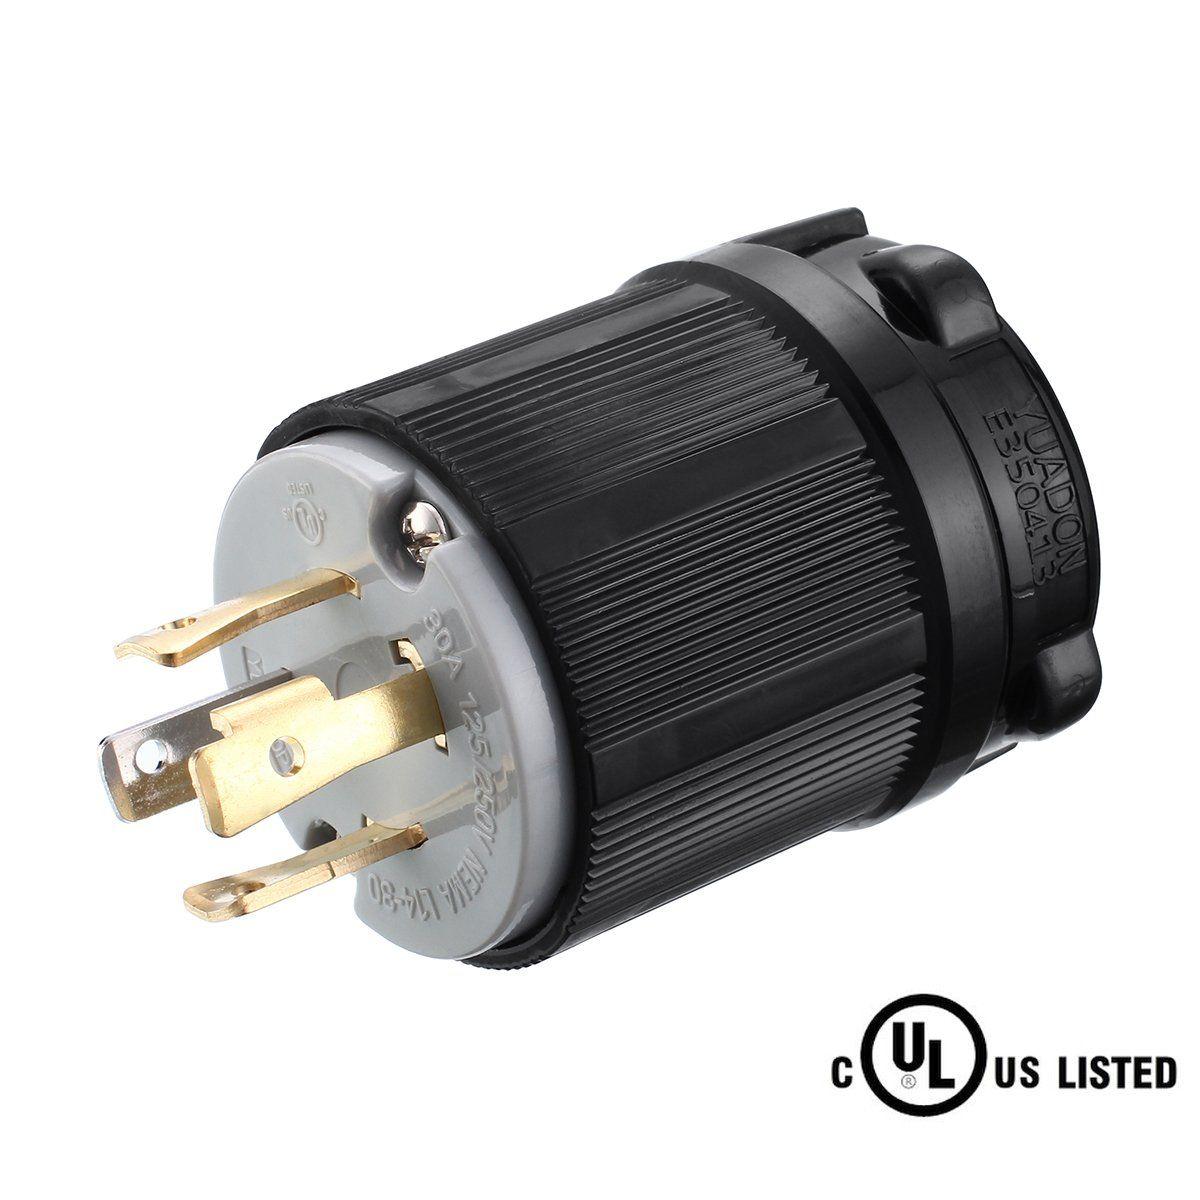 Miady NEMA L14-30P Generator Plug, 30 Amp 4-Prong Industrial Grade ...